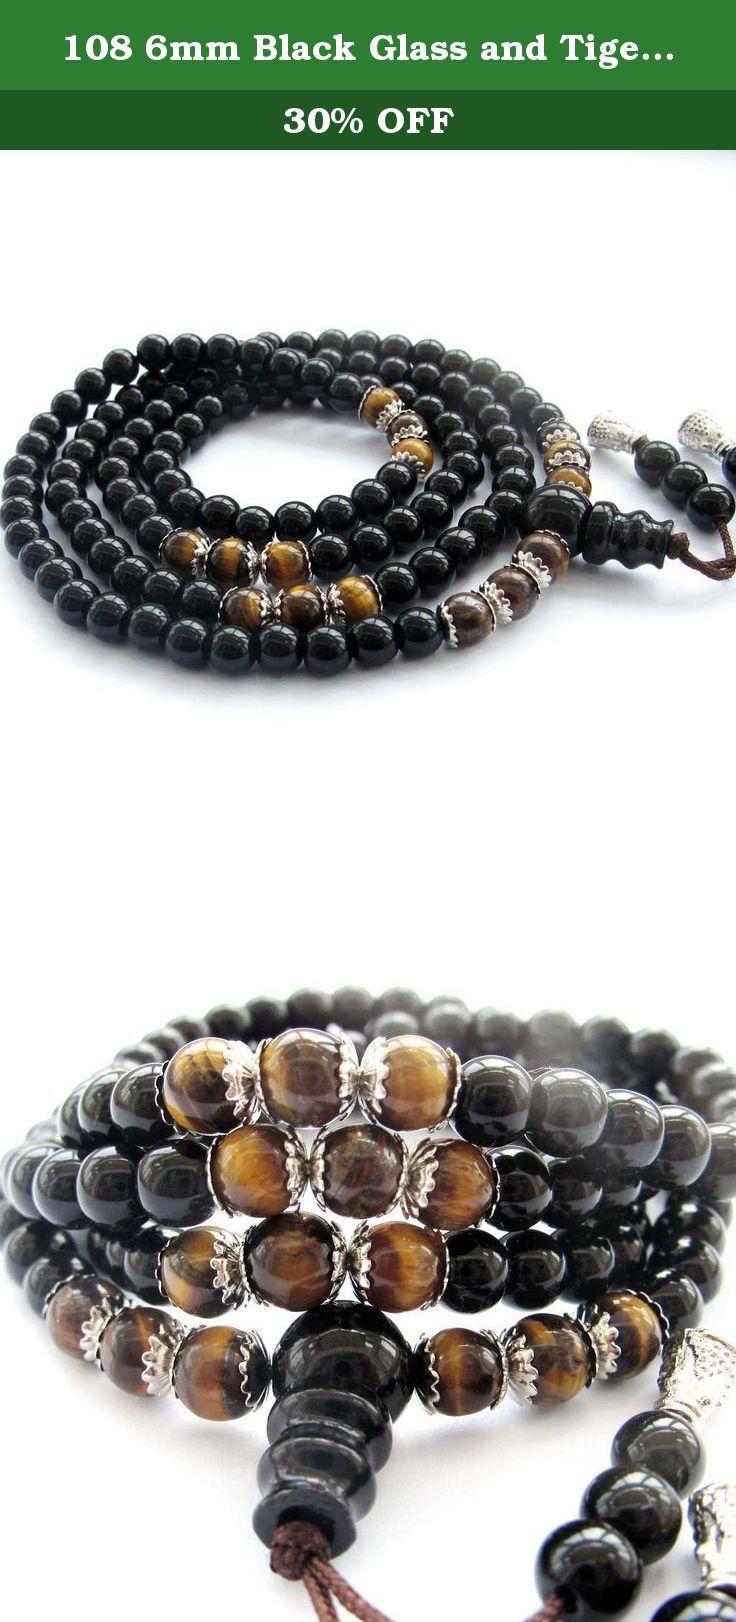 108 6mm Black Glass and Tiger Eye Beads Tibetan Buddhist Prayer Mala Necklace or Wrist Mala. 108 6mm Black Glass and Tiger Eye Beads Tibetan Buddhist Prayer Mala Necklace or Wrist Mala.